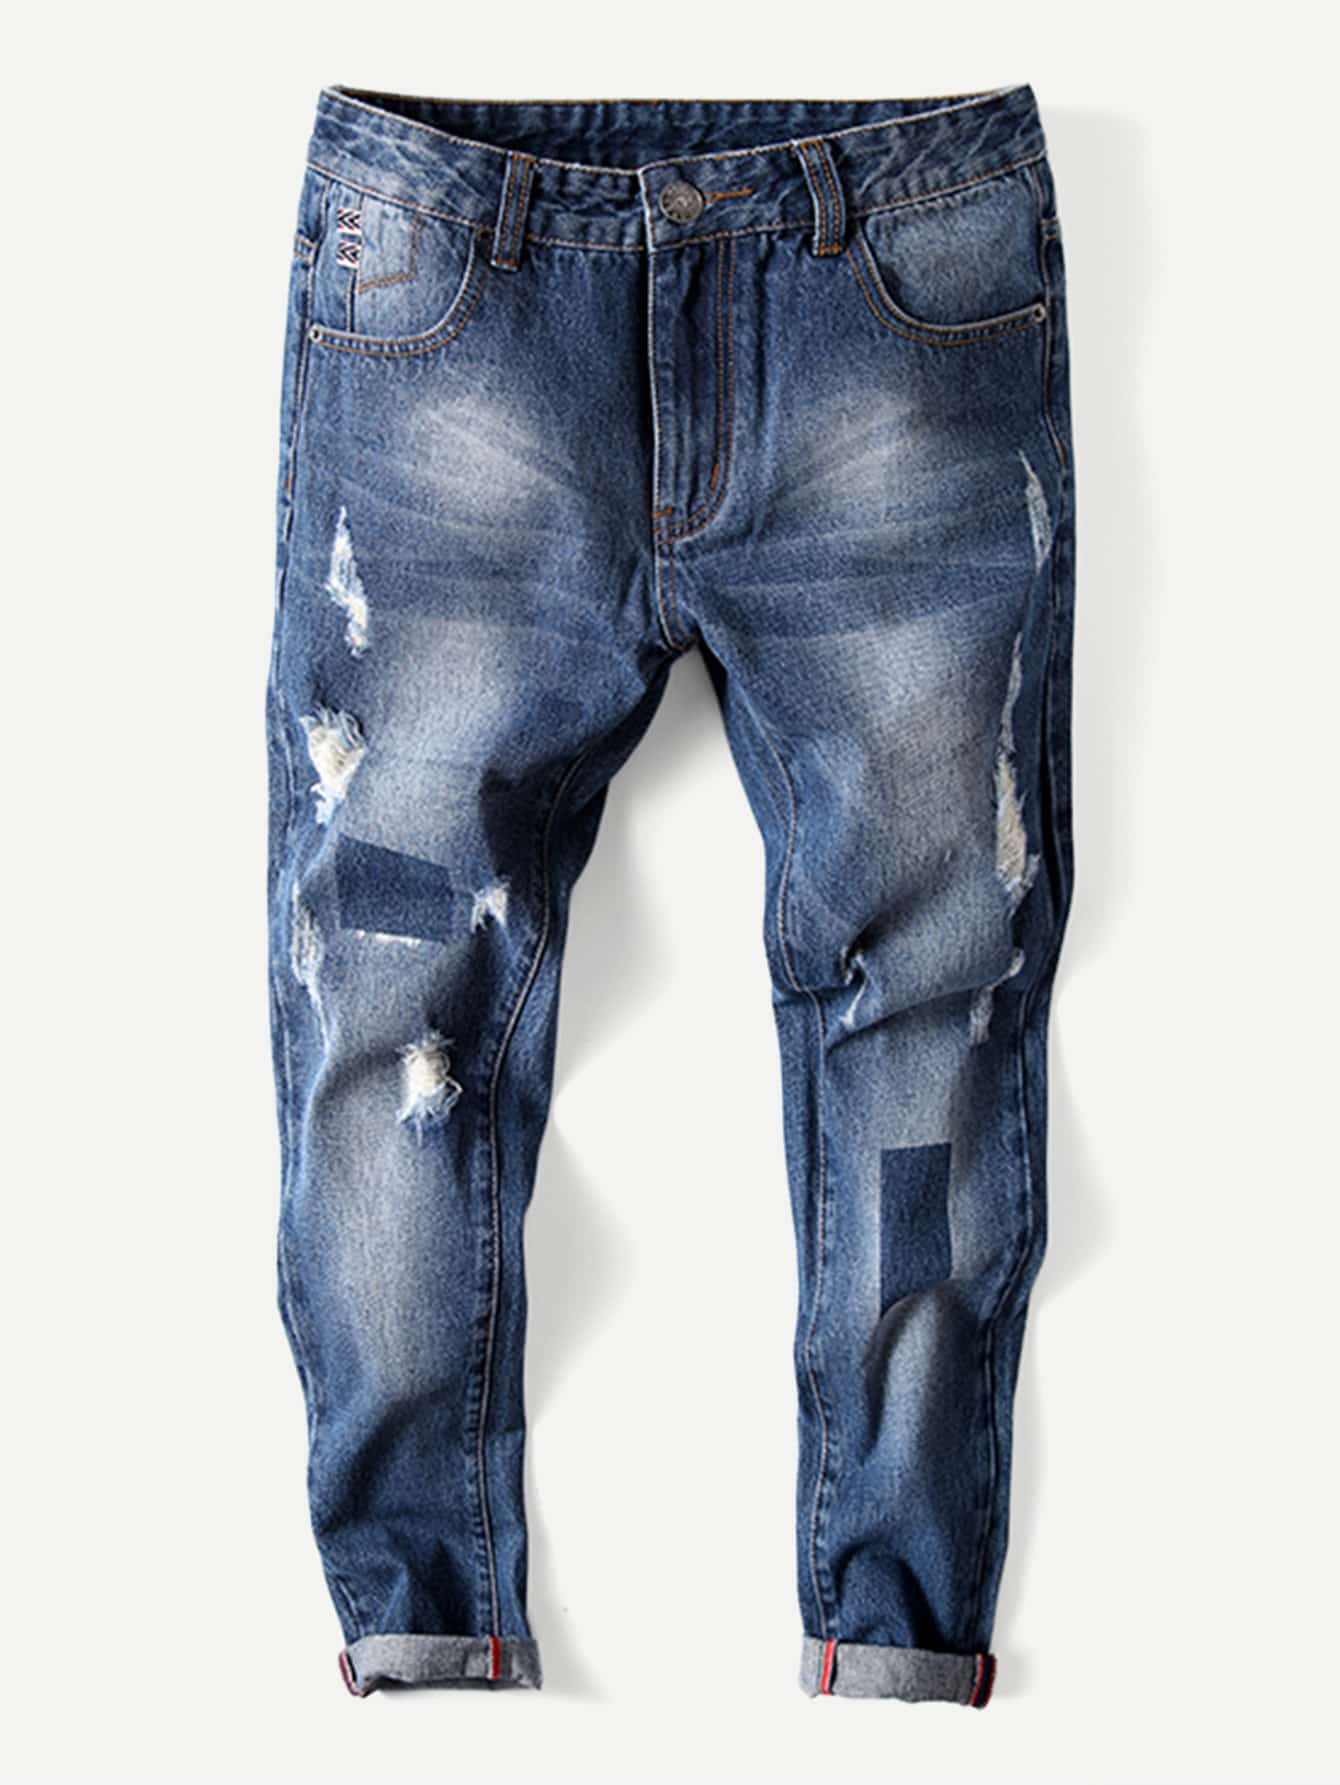 m nner zerrissene jeans mit gerolltem saum german shein sheinside. Black Bedroom Furniture Sets. Home Design Ideas